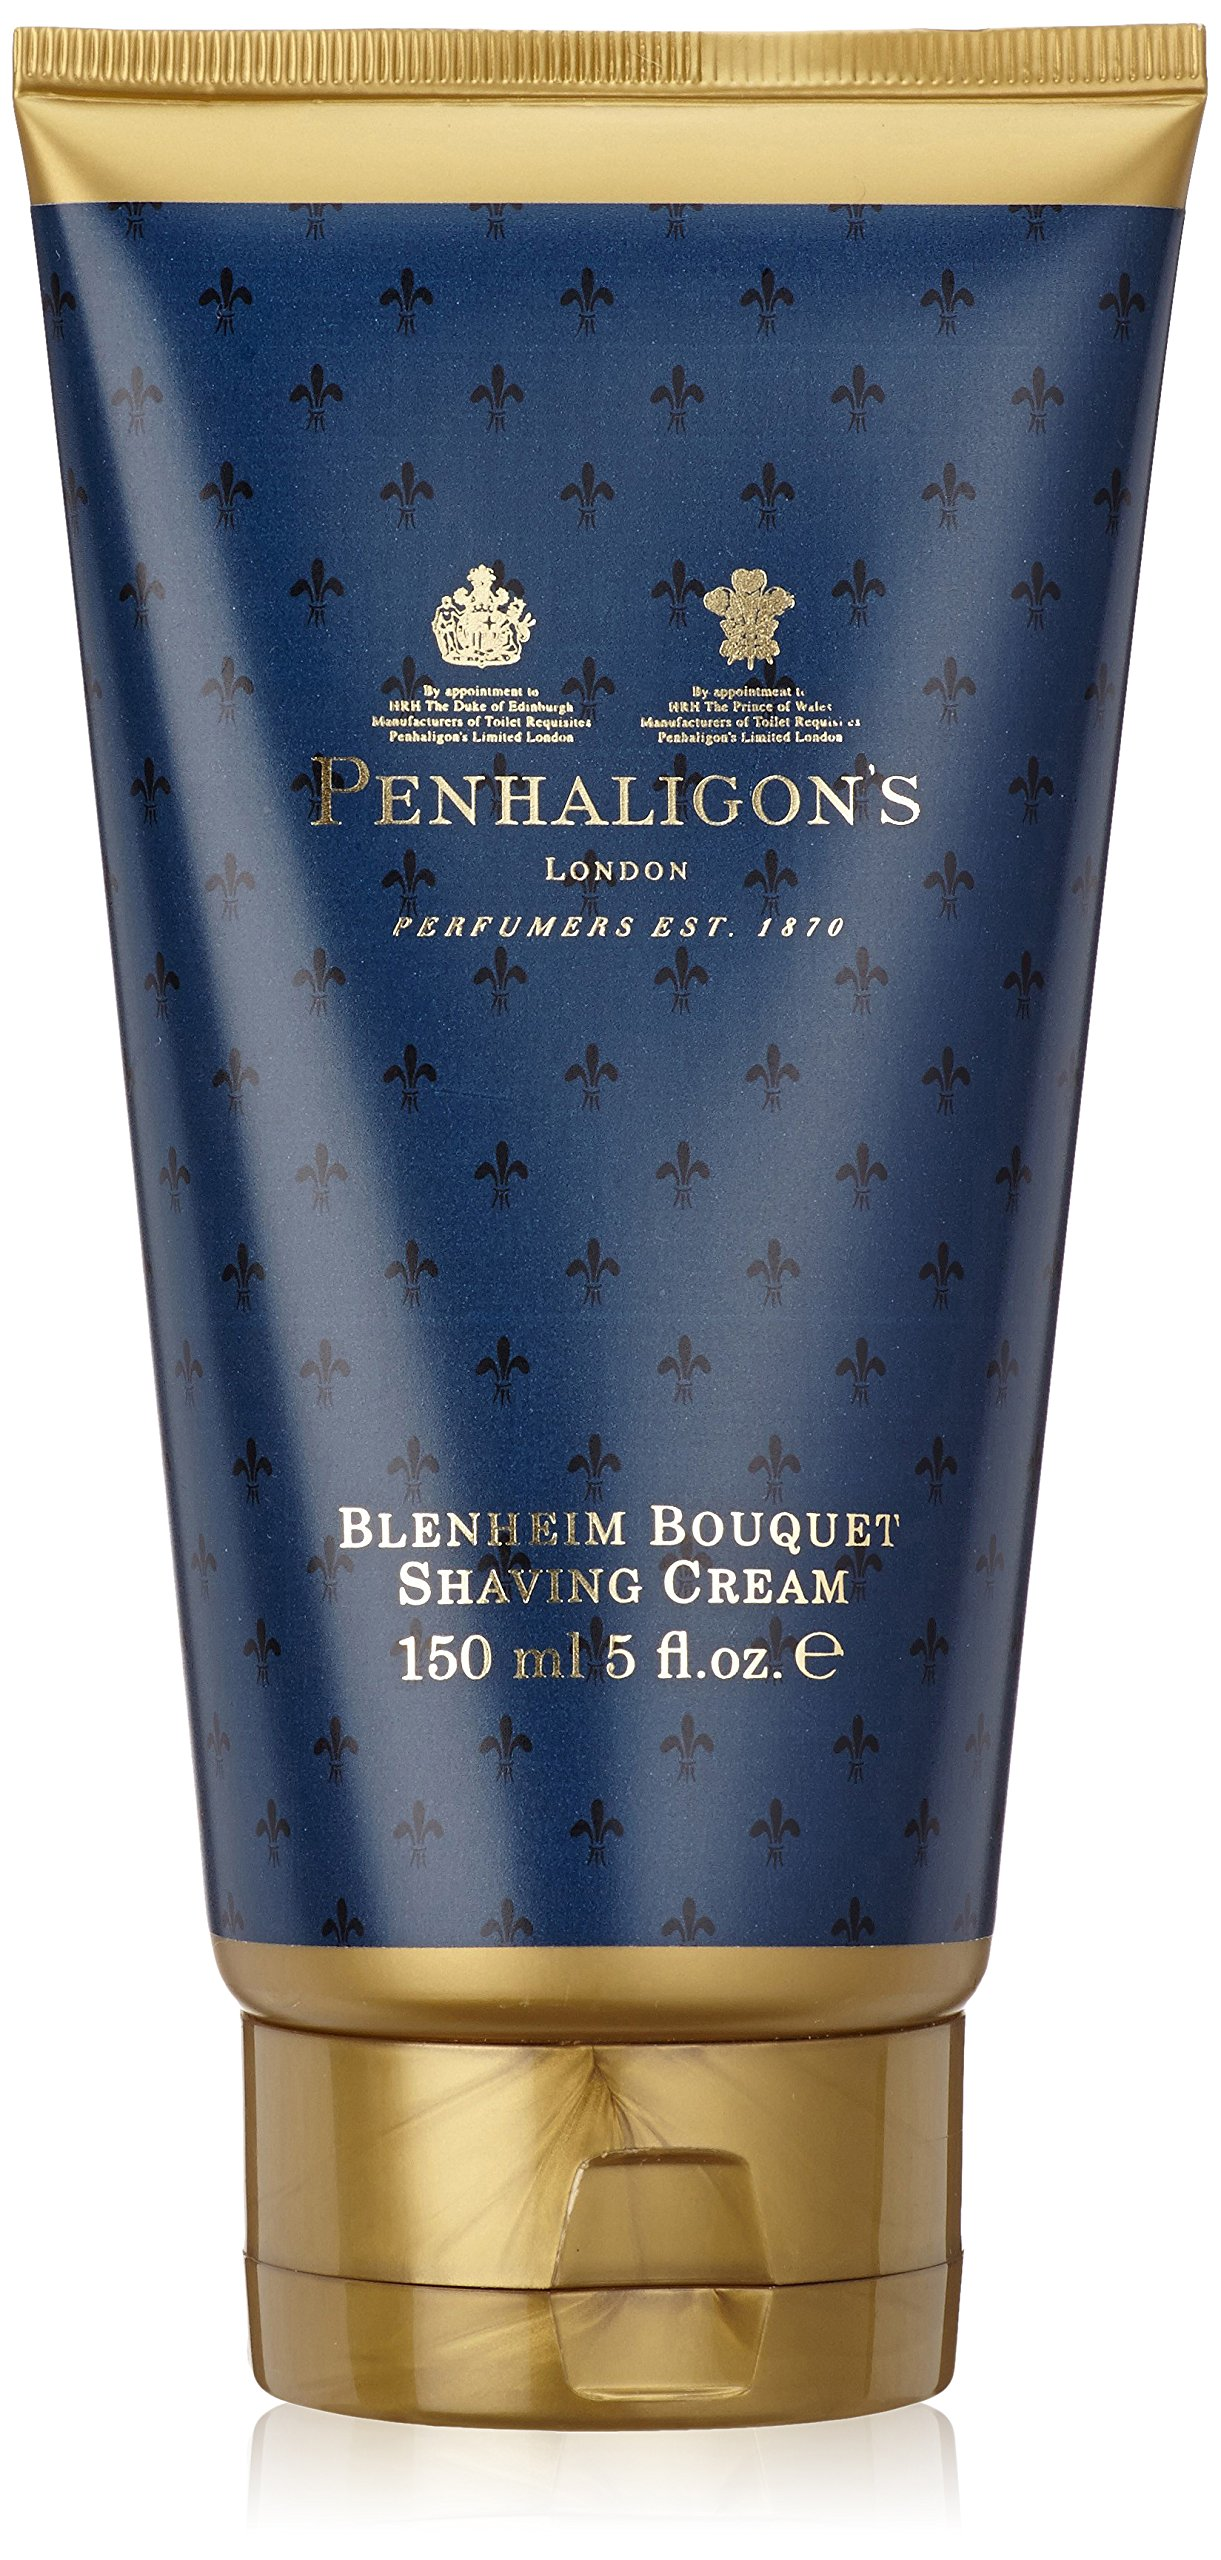 Penhaligon's Blenheim Bouquet Shaving Cream 150 ml